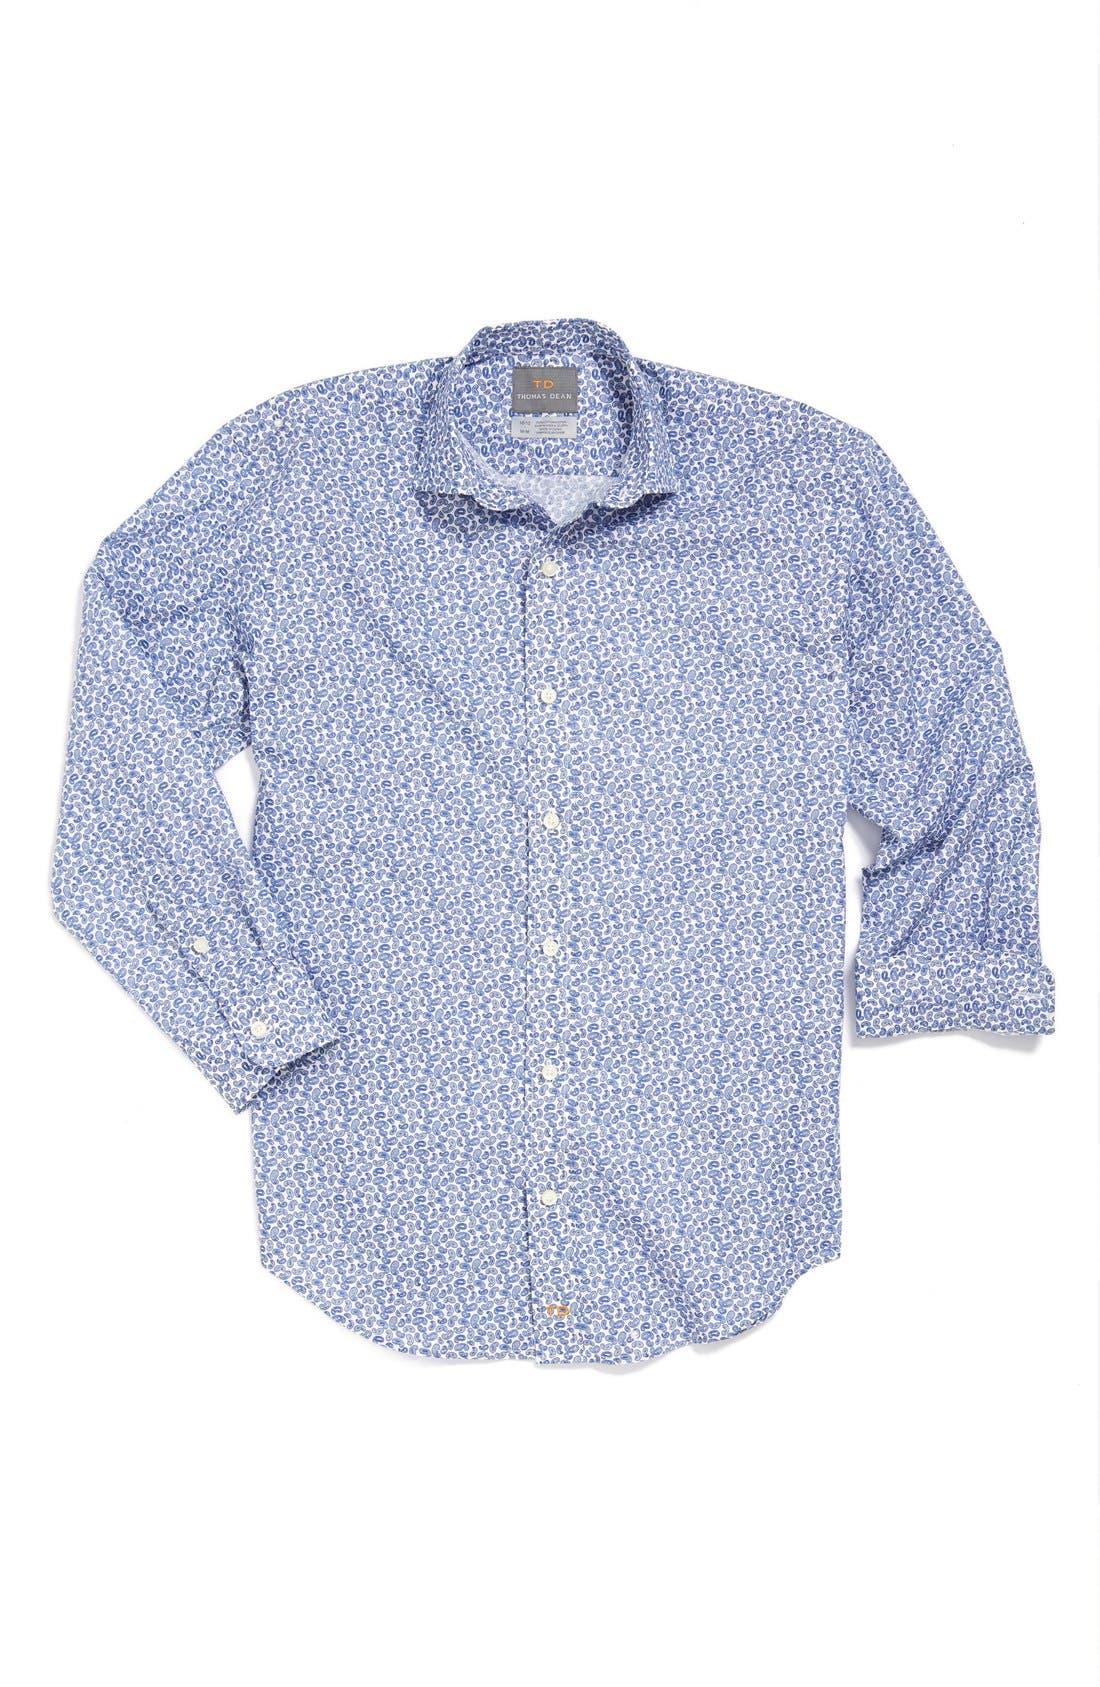 Alternate Image 1 Selected - Thomas Dean Print Poplin Dress Shirt (Big Boys)